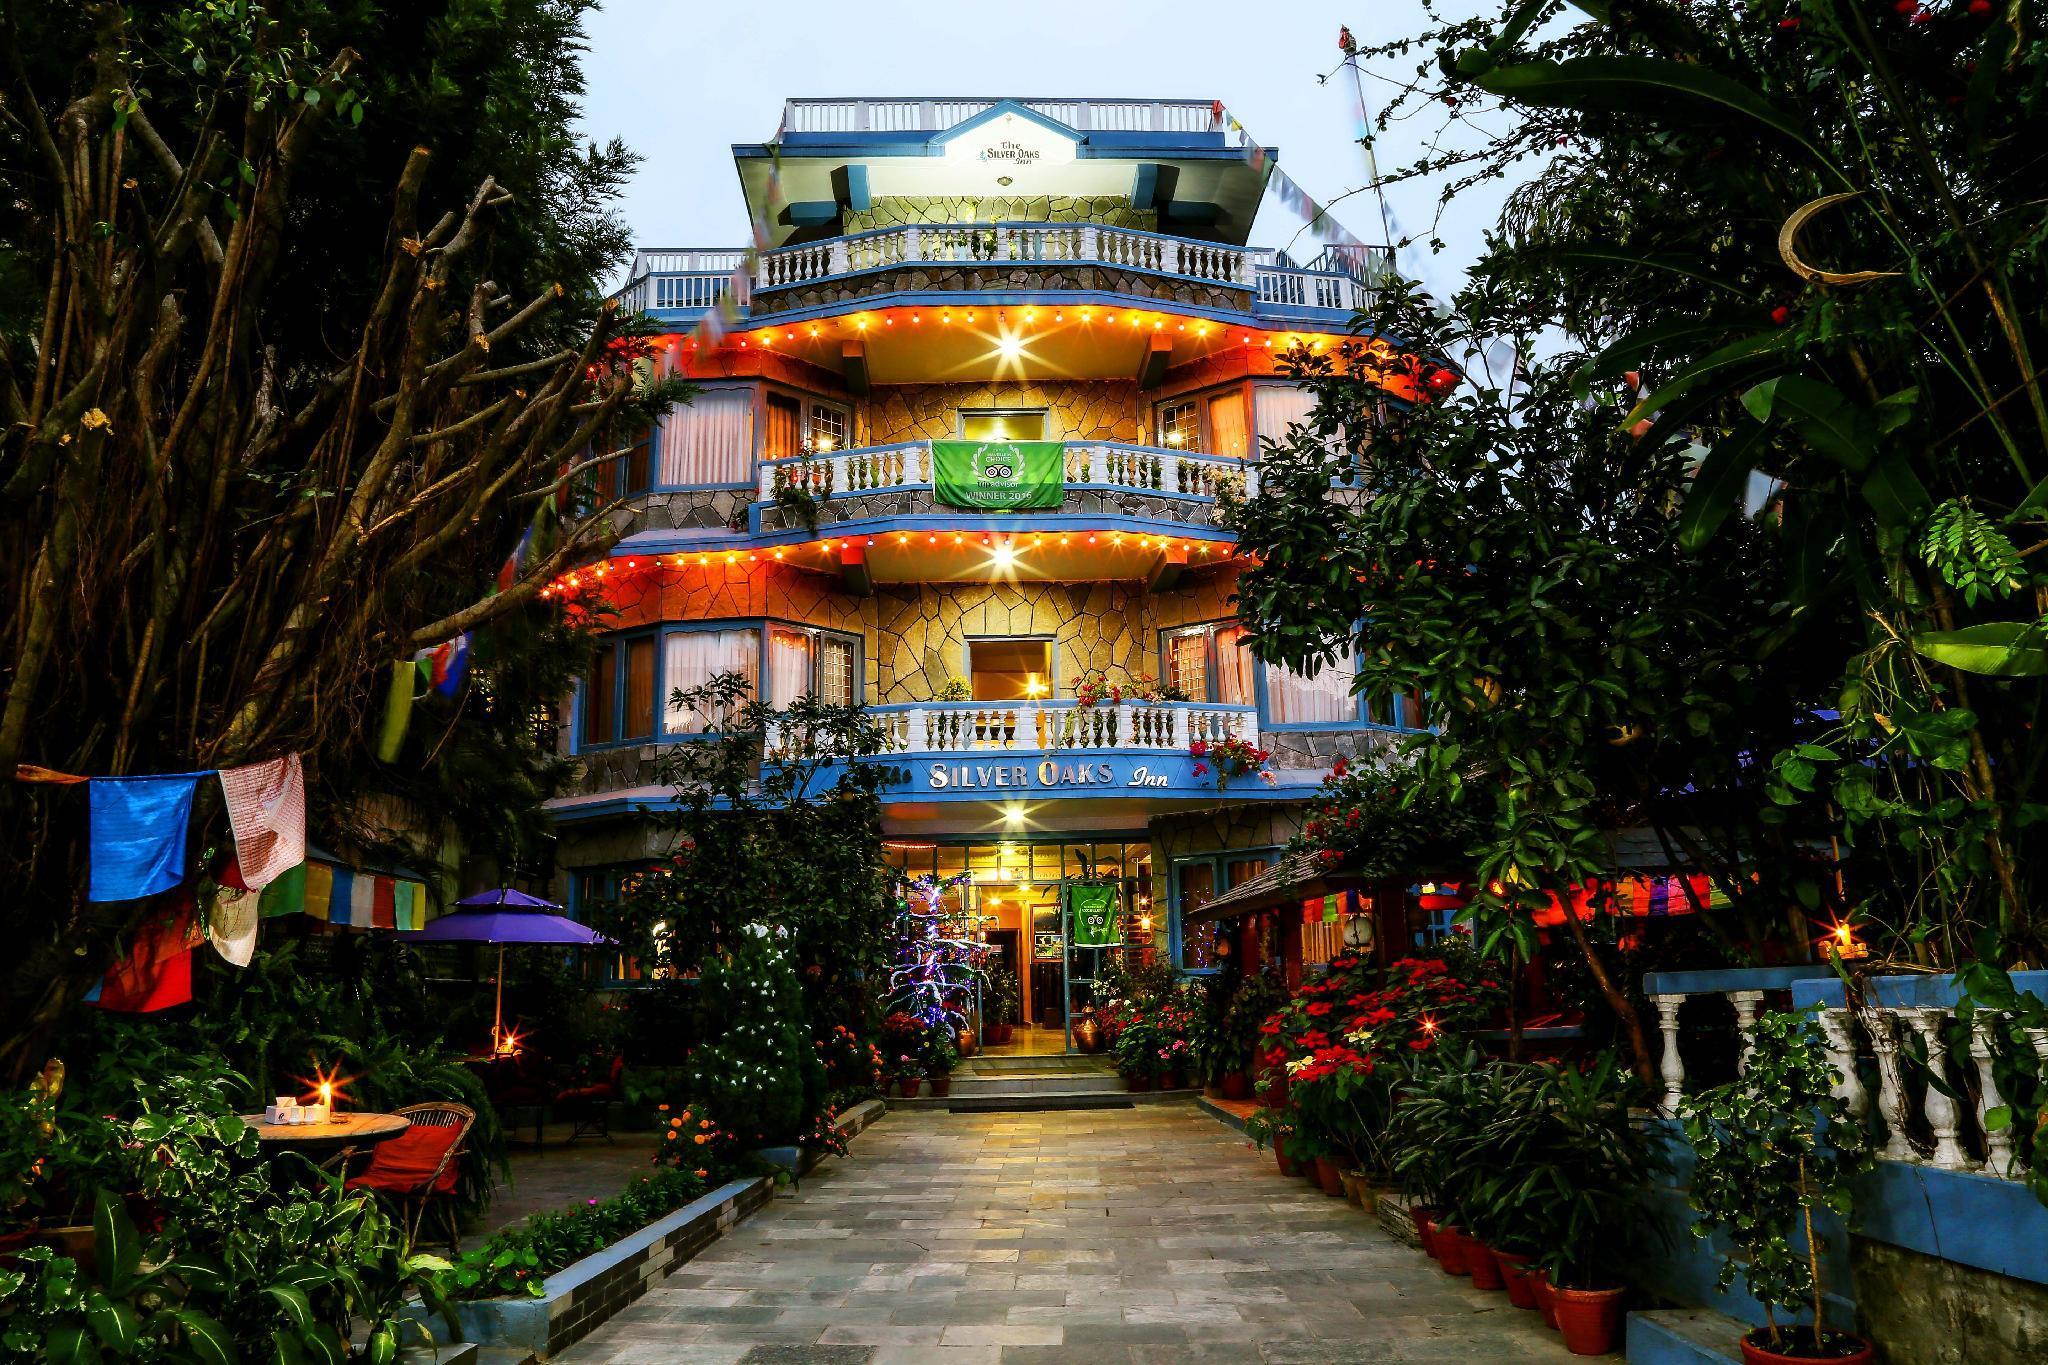 The Silver Oaks Inn